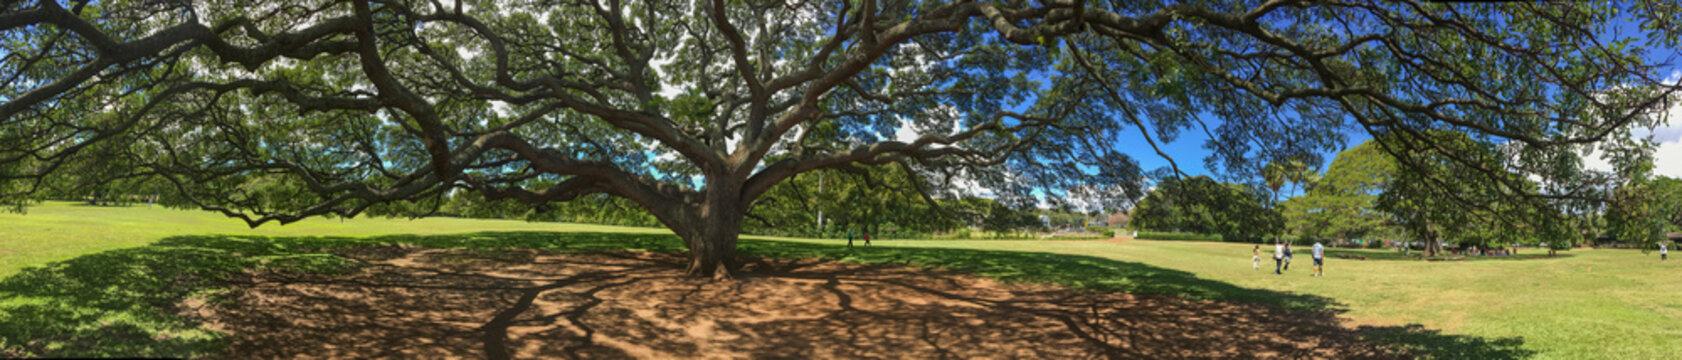 Giant Monkey Pod tree Panorama